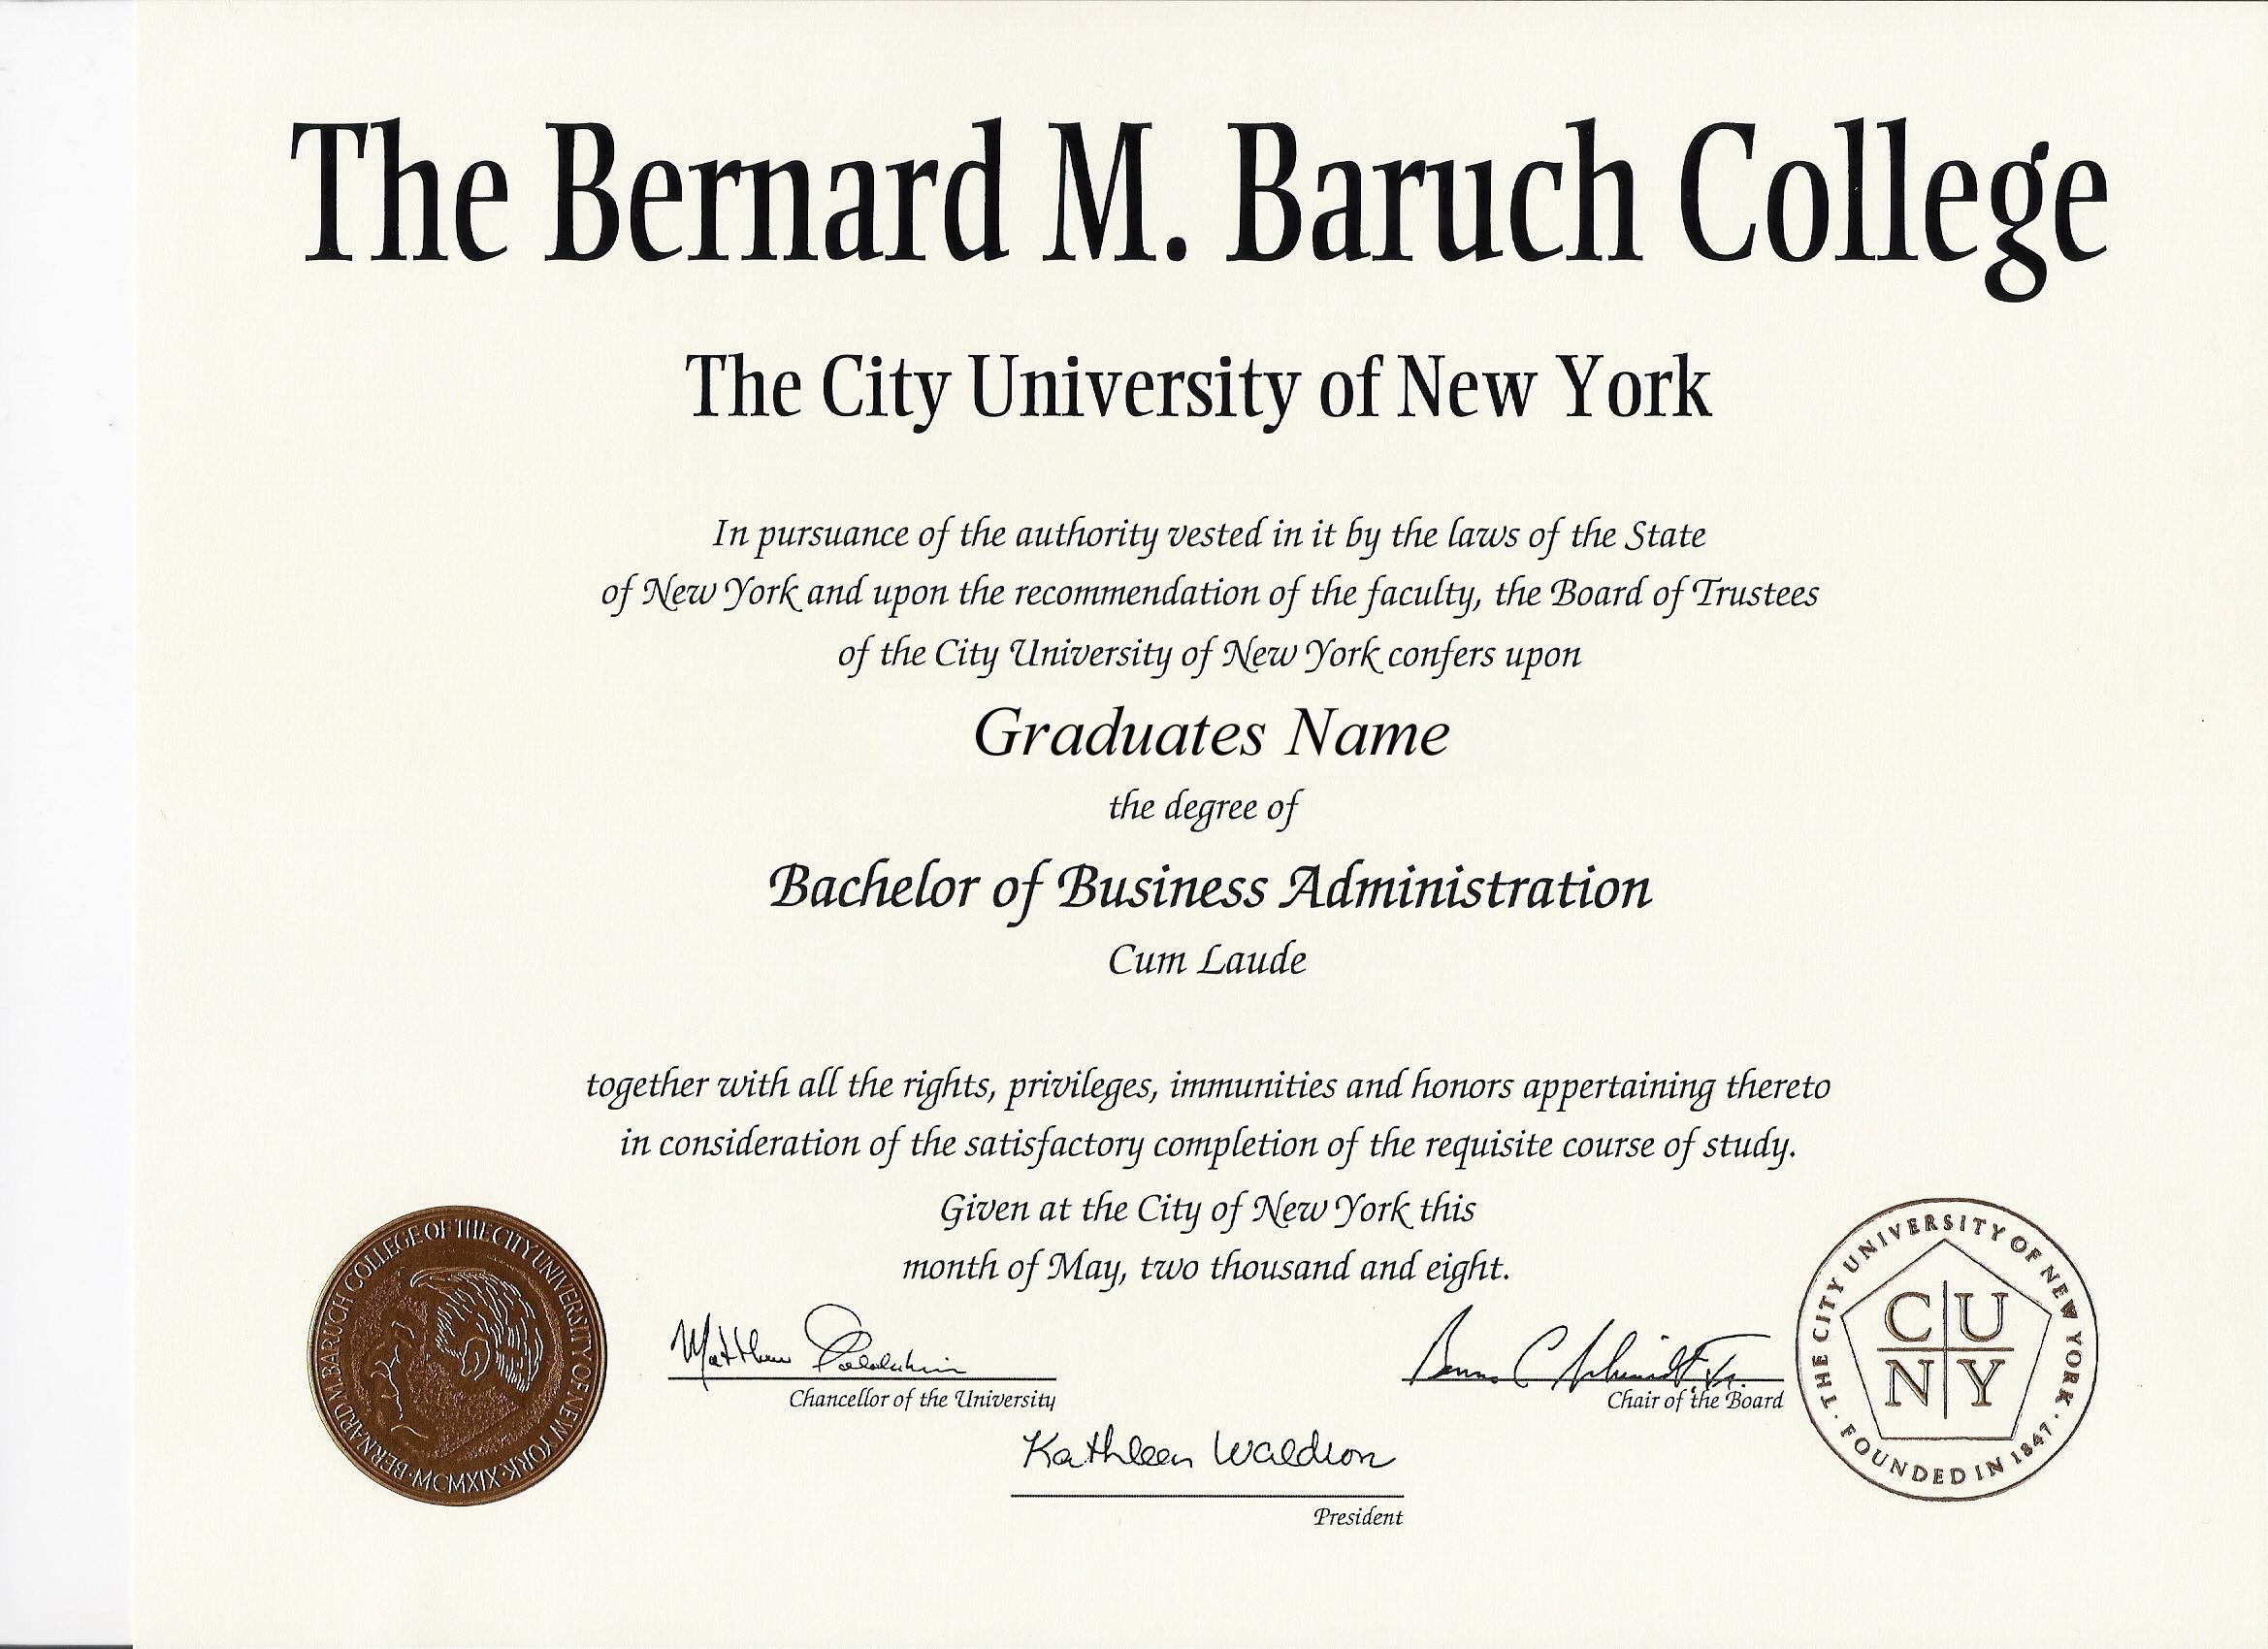 bernard m baruch college graduation gift